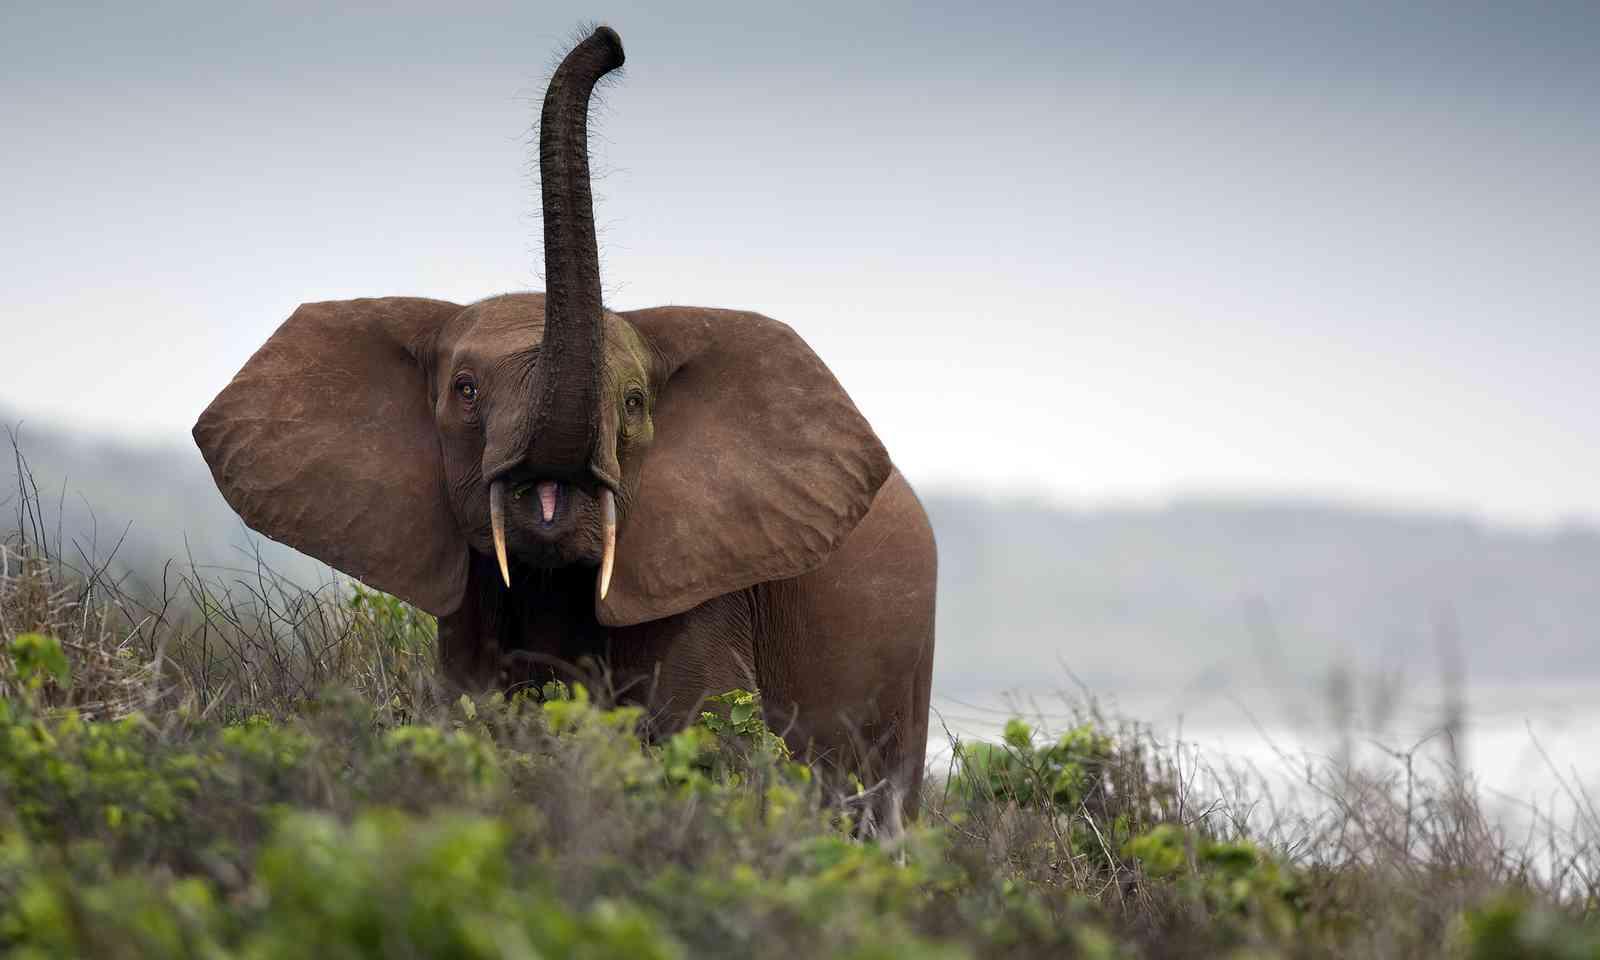 Forest elephant in Gabon (Dreamstime)